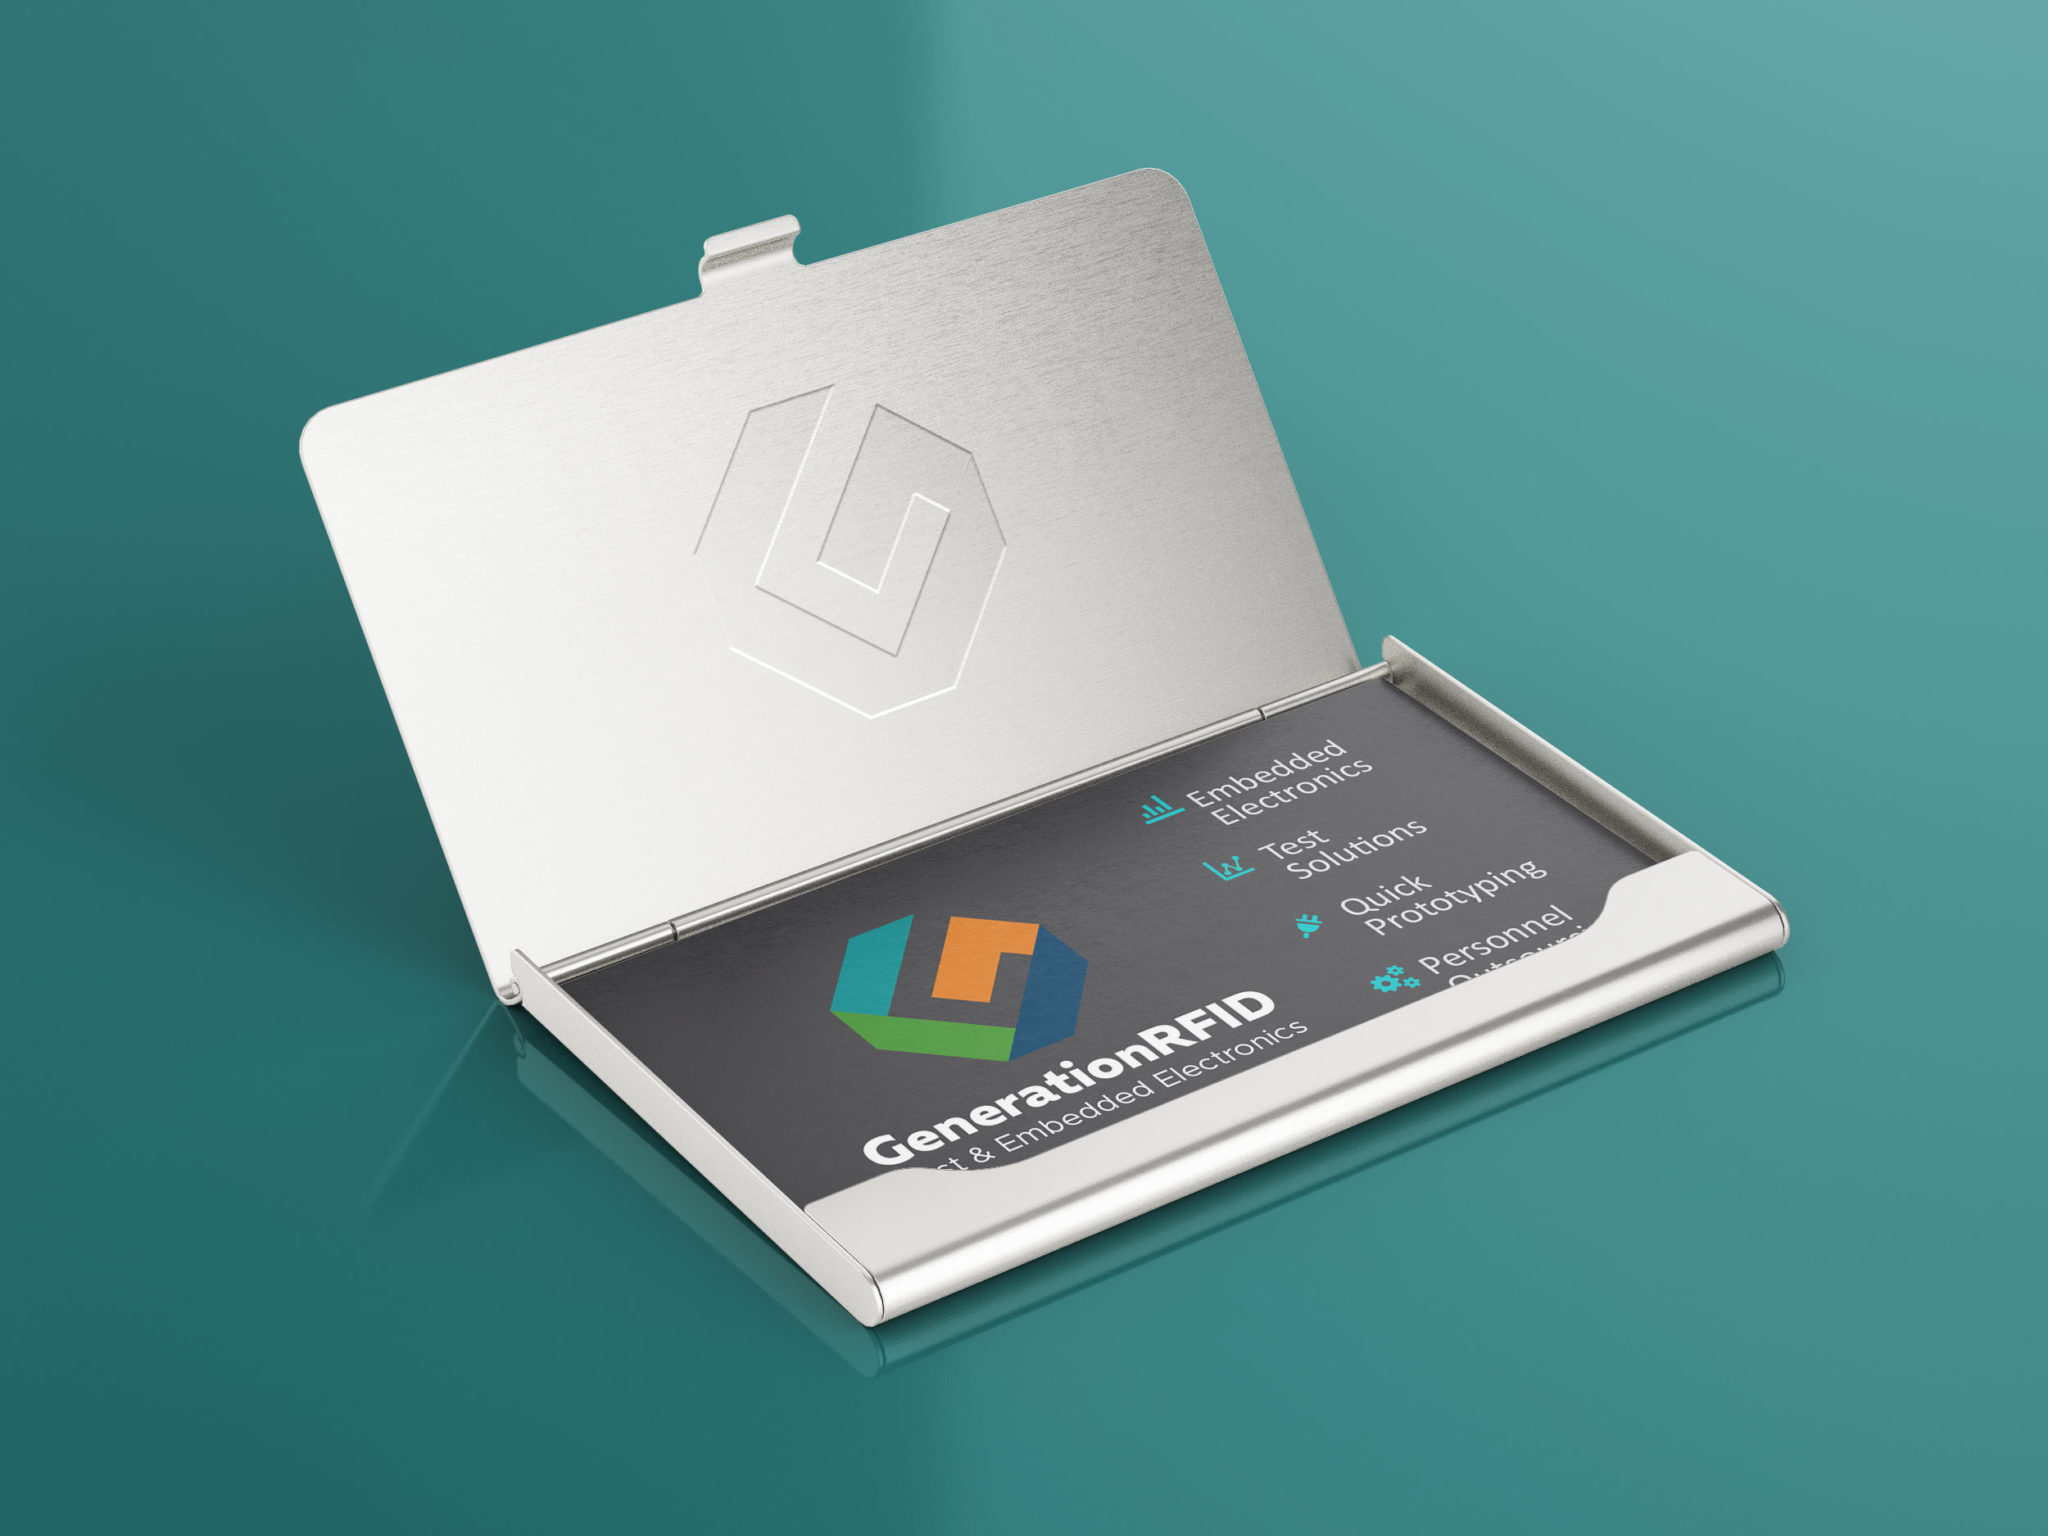 GenerationRFID-Cards-Disseny-Grafic-Test-Embedded-Electronics-Angels-Pinyol